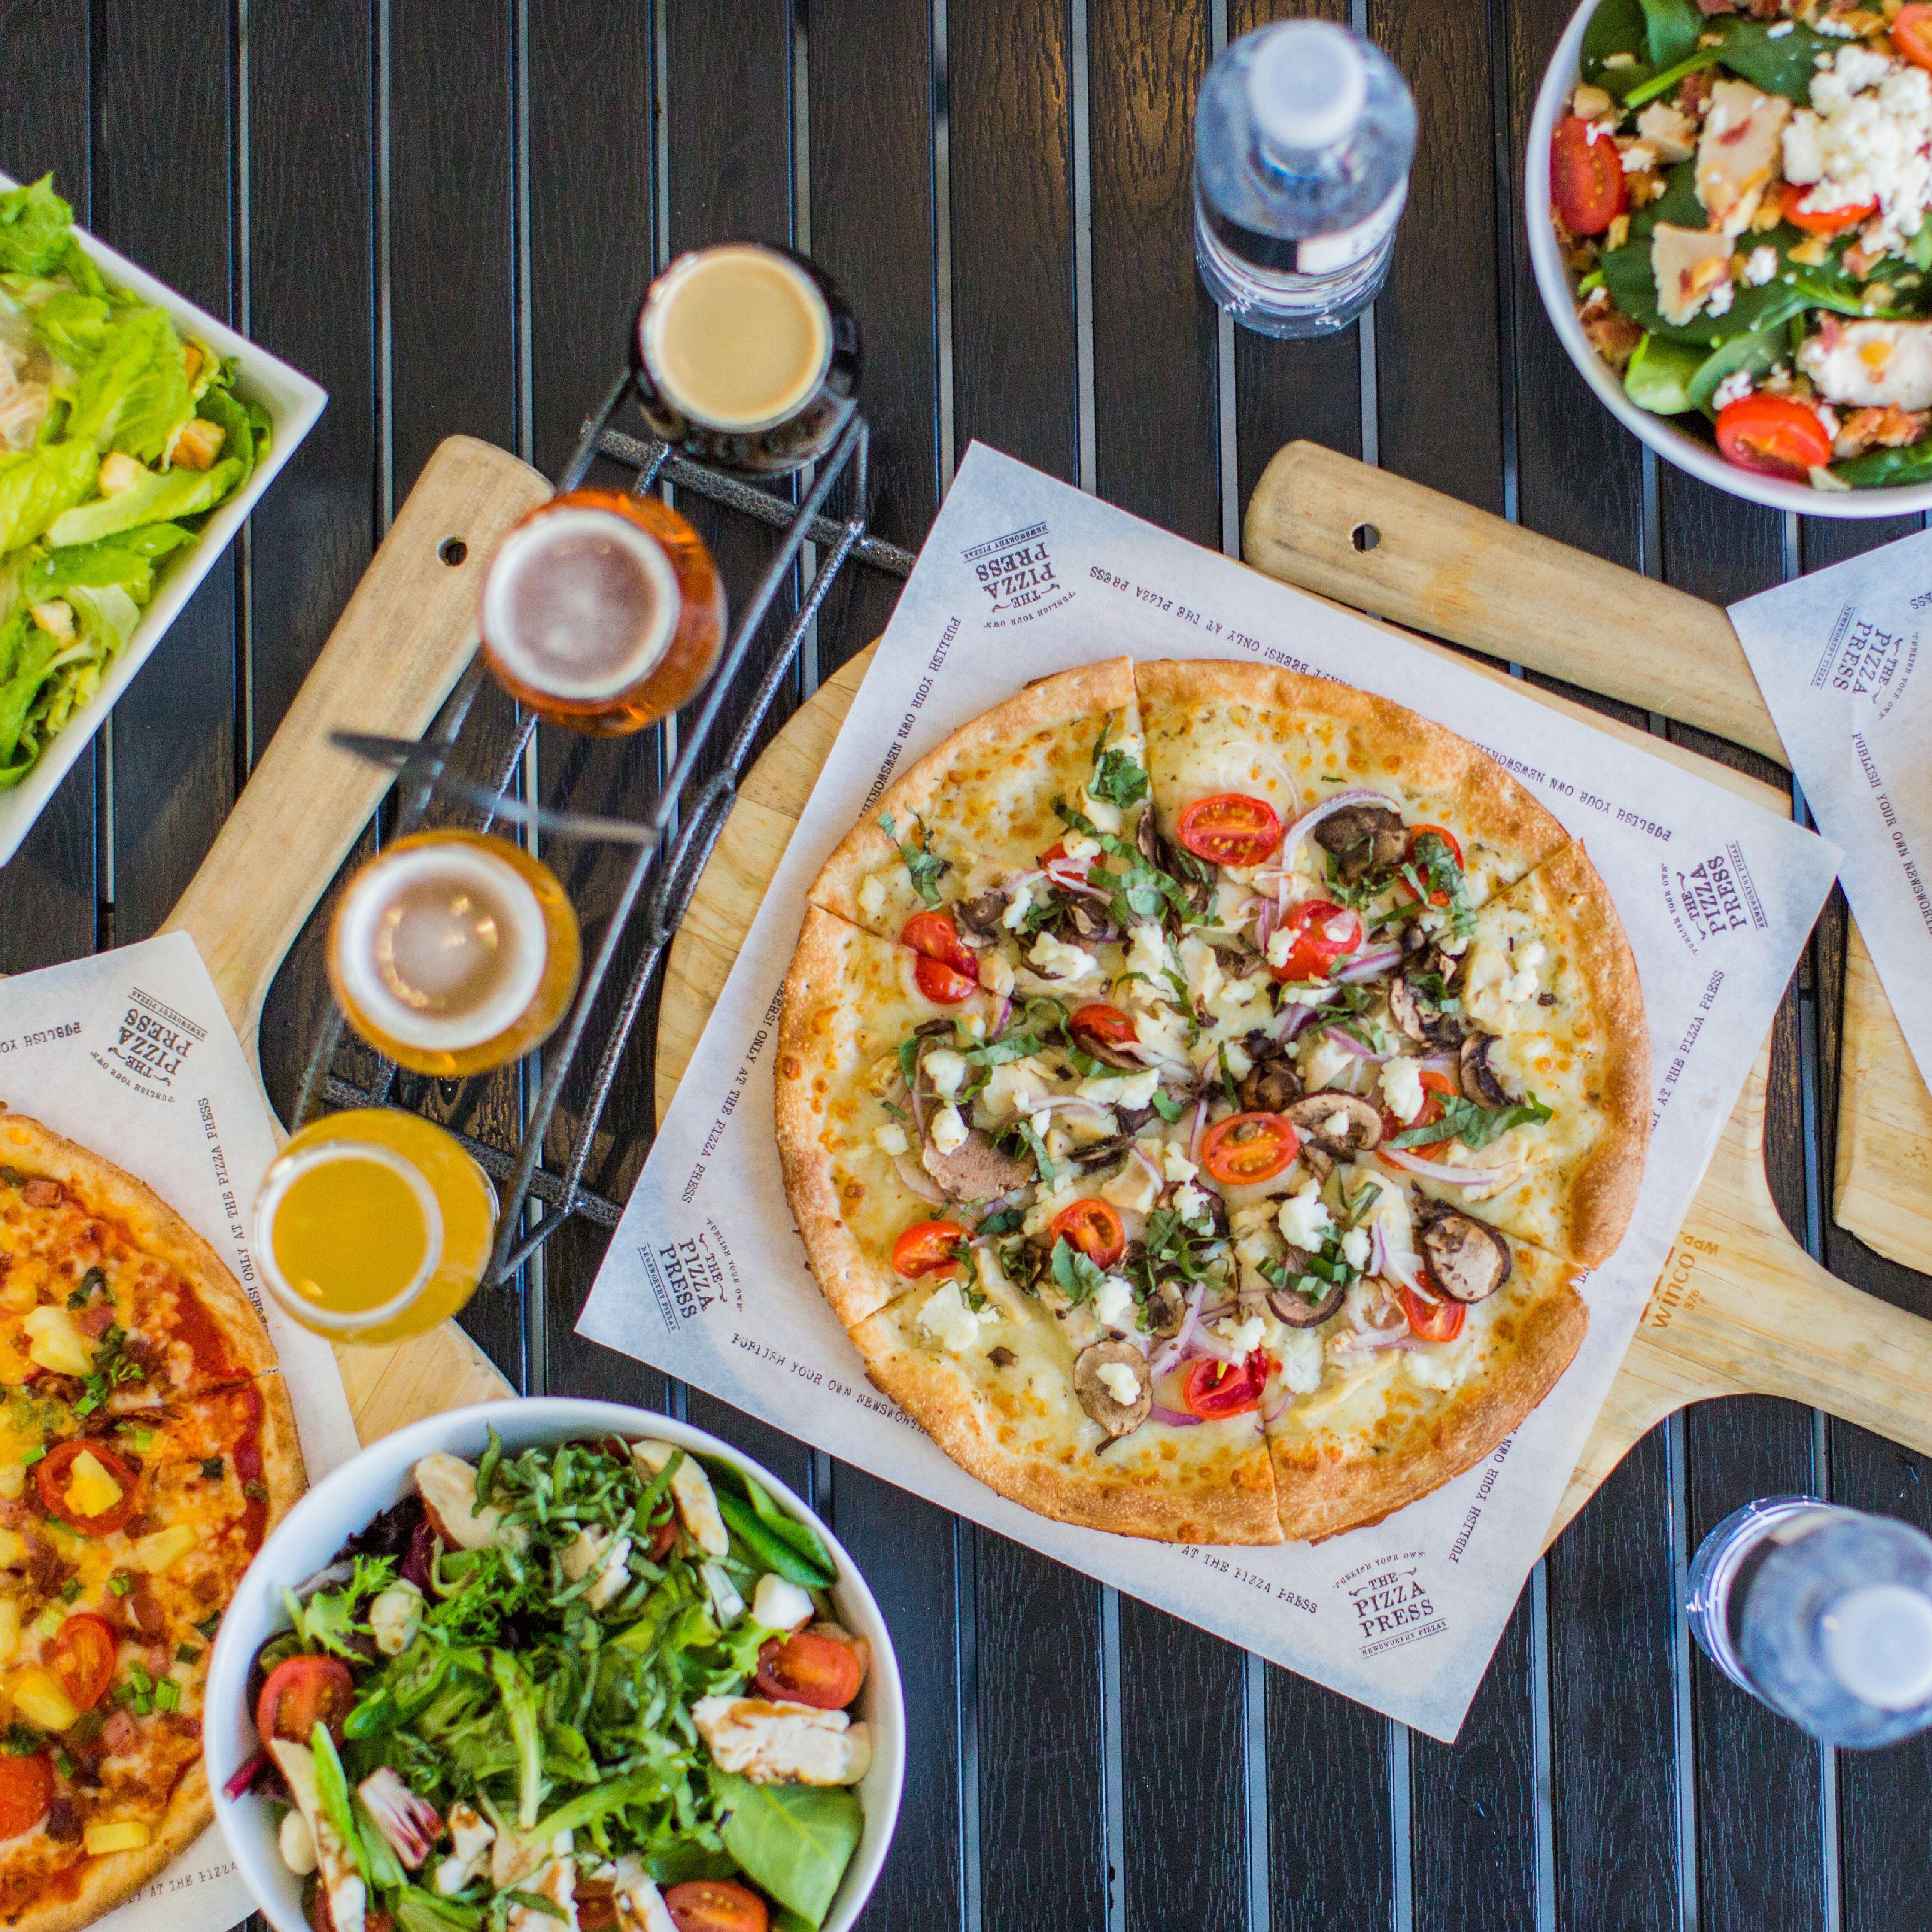 Business Member Spotlight: The Pizza Press